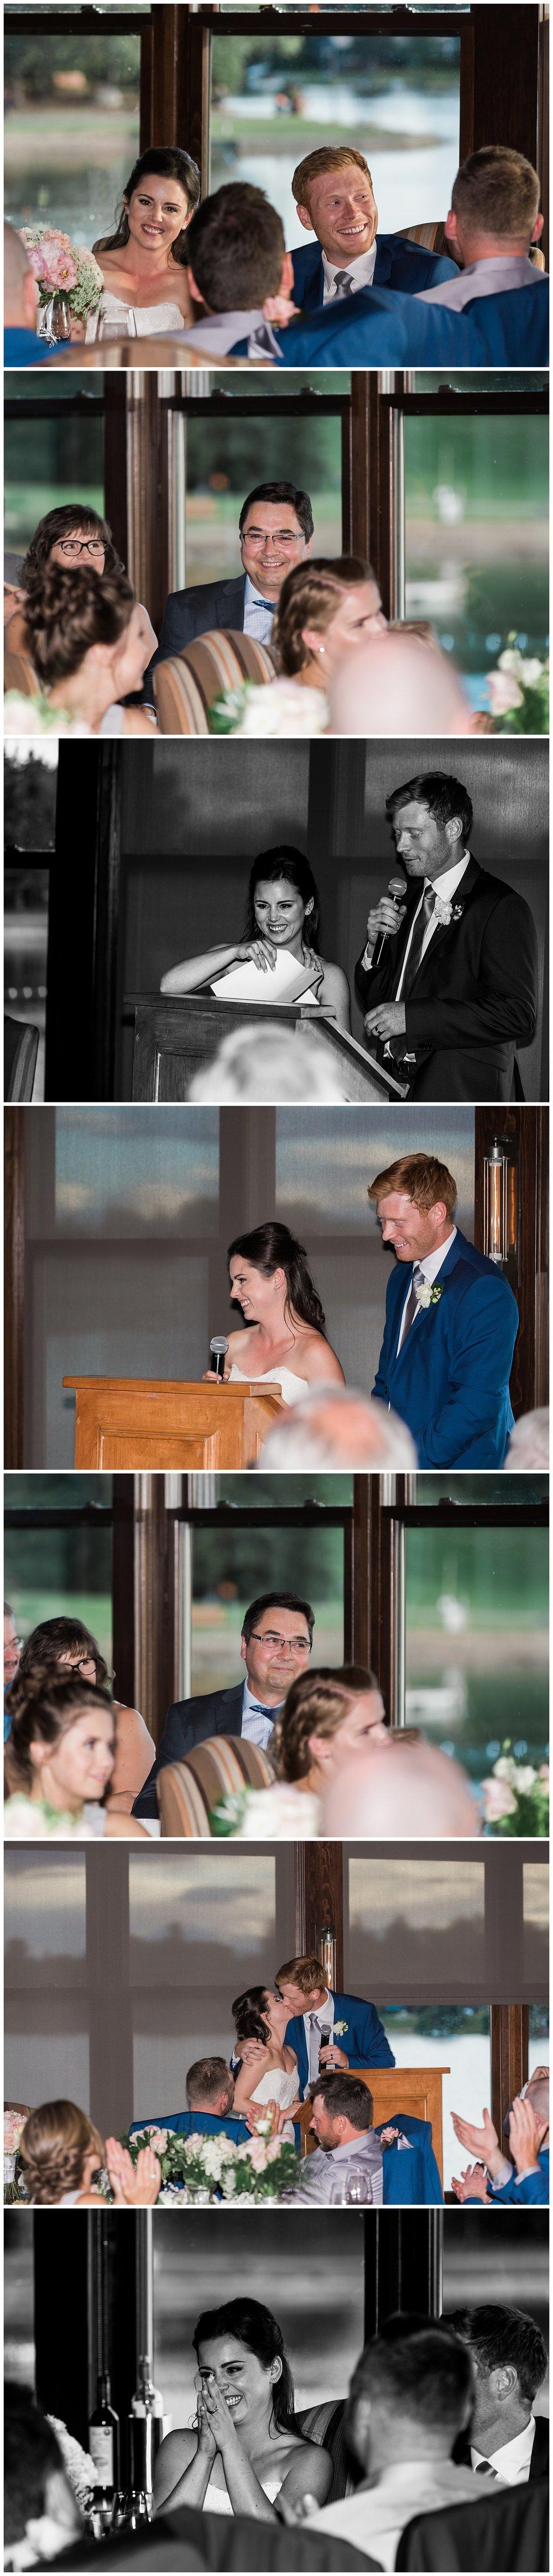 calgary-photographer-lake-house-wedding-26.jpg